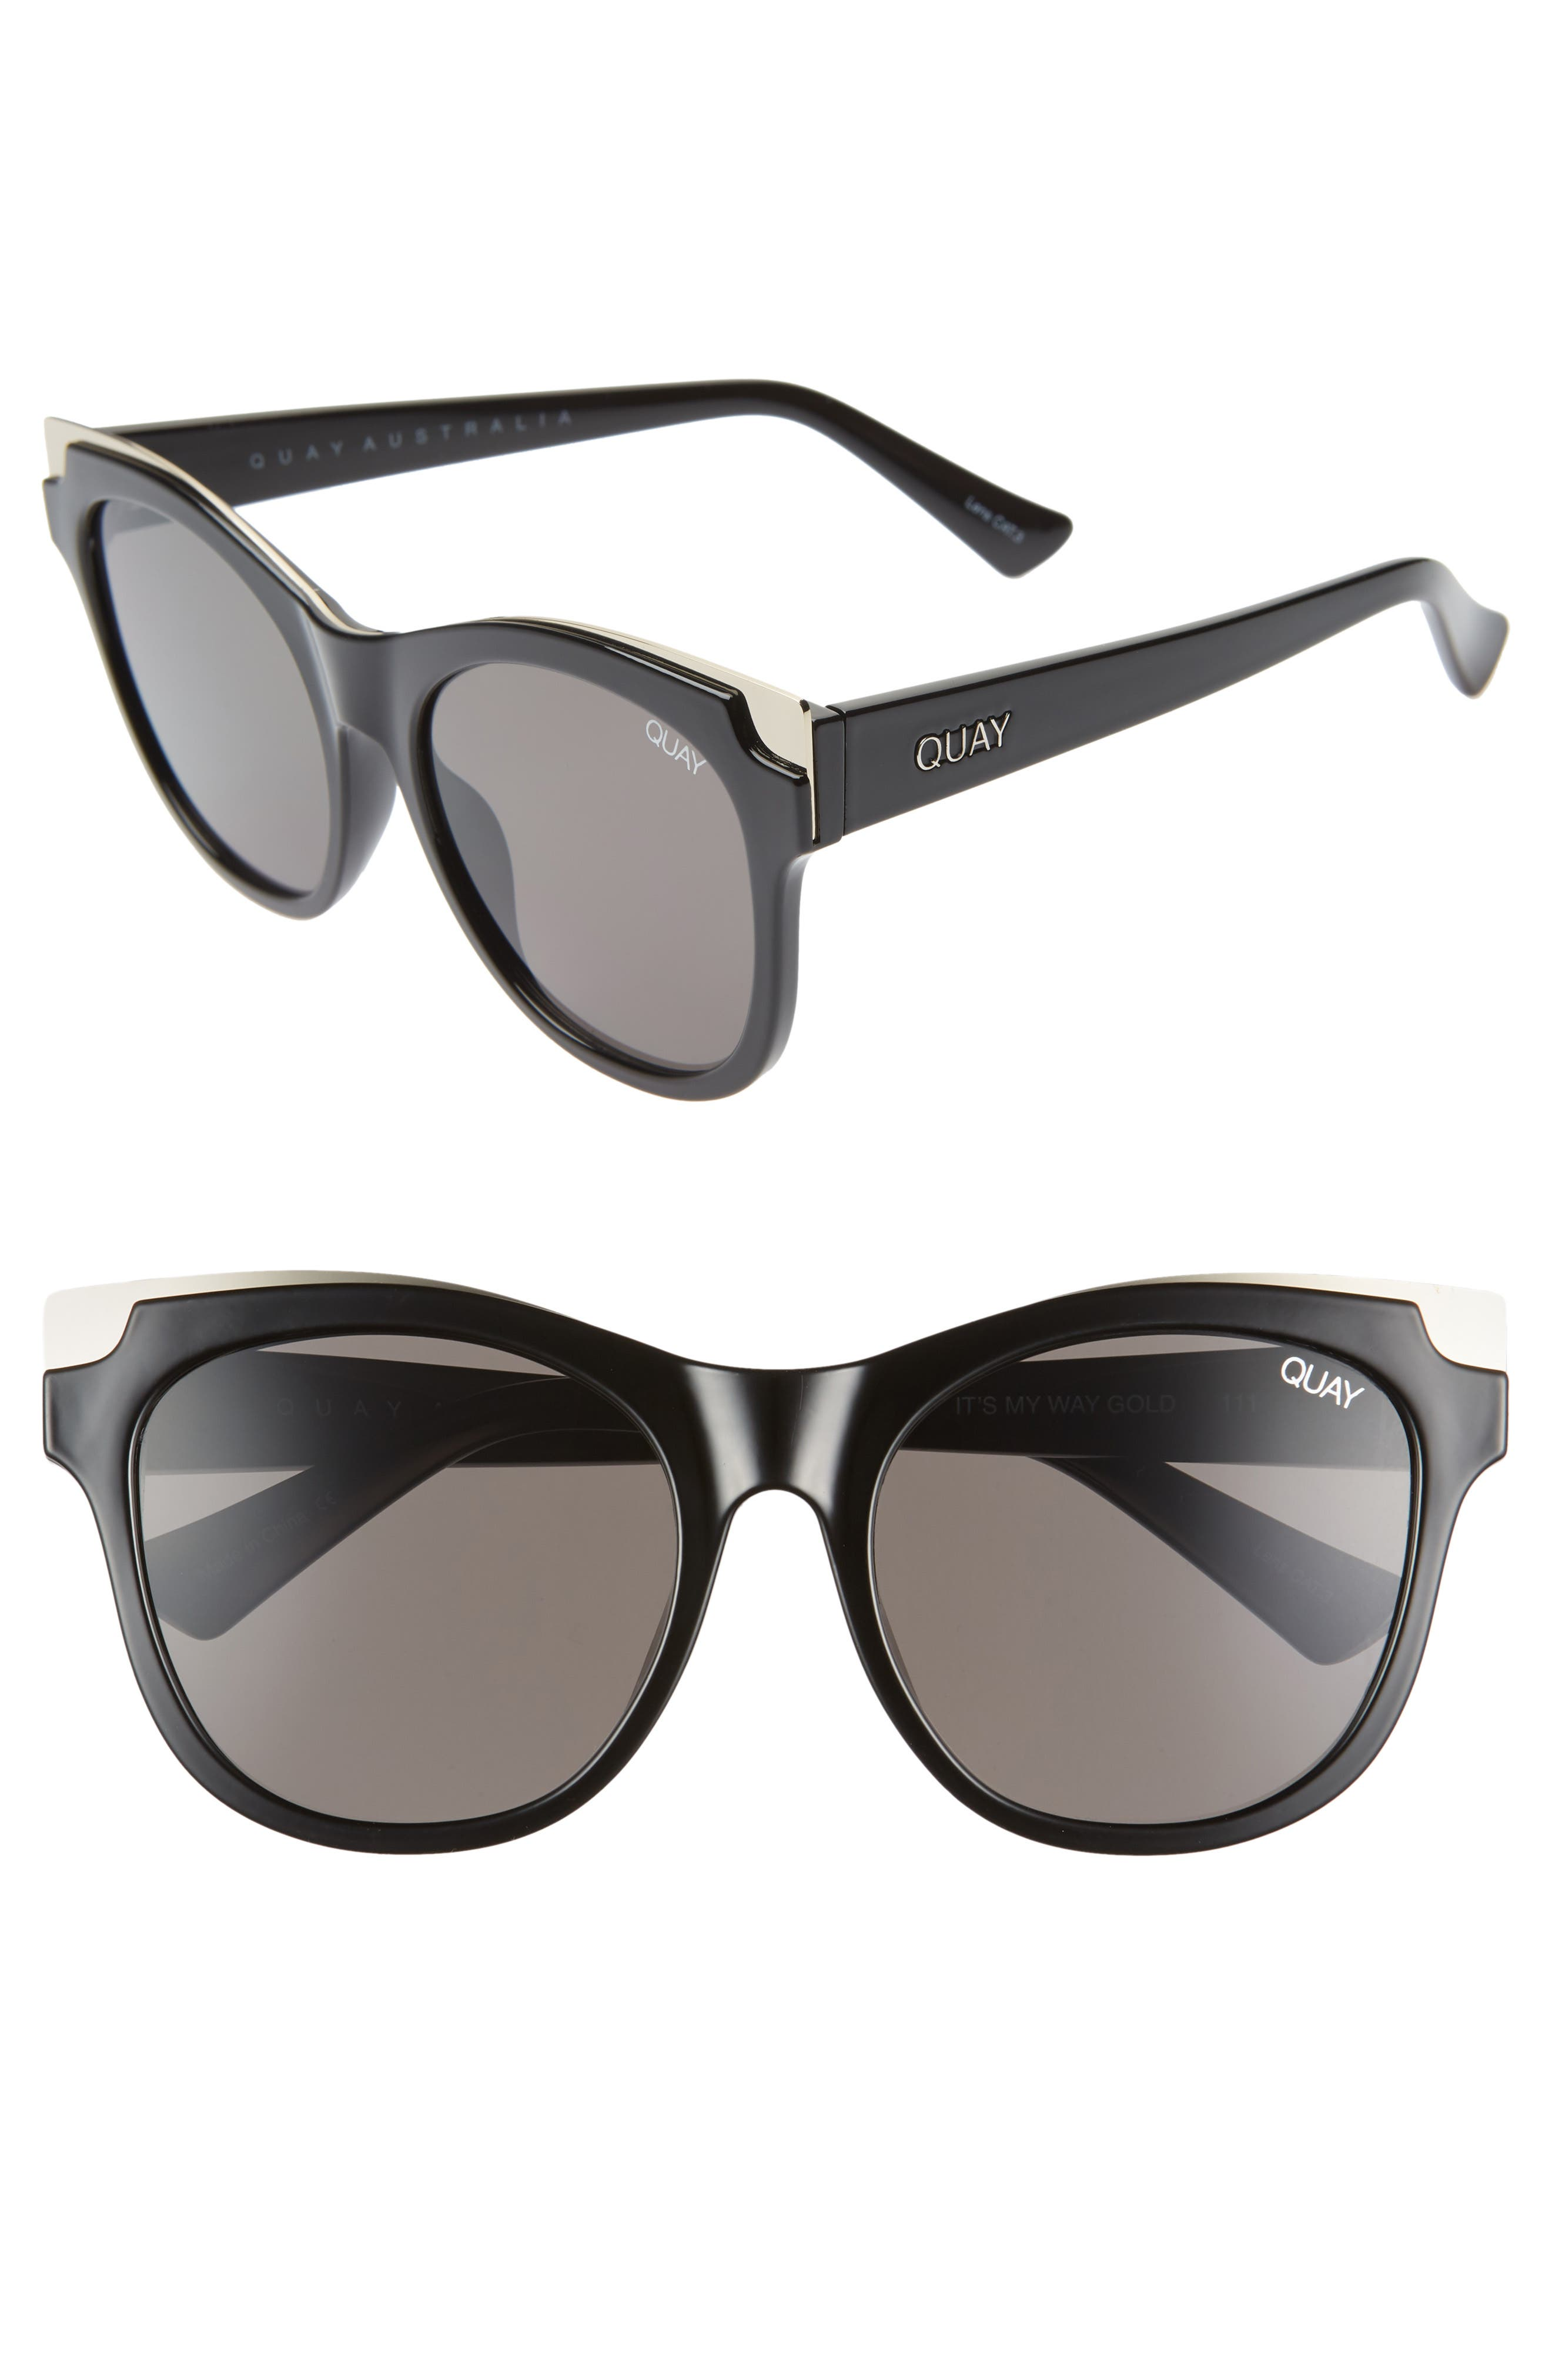 ef66fc5845ea7 Quay Australia It S My Way 5m Cat Eye Sunglasses - Black Gold  Smoke